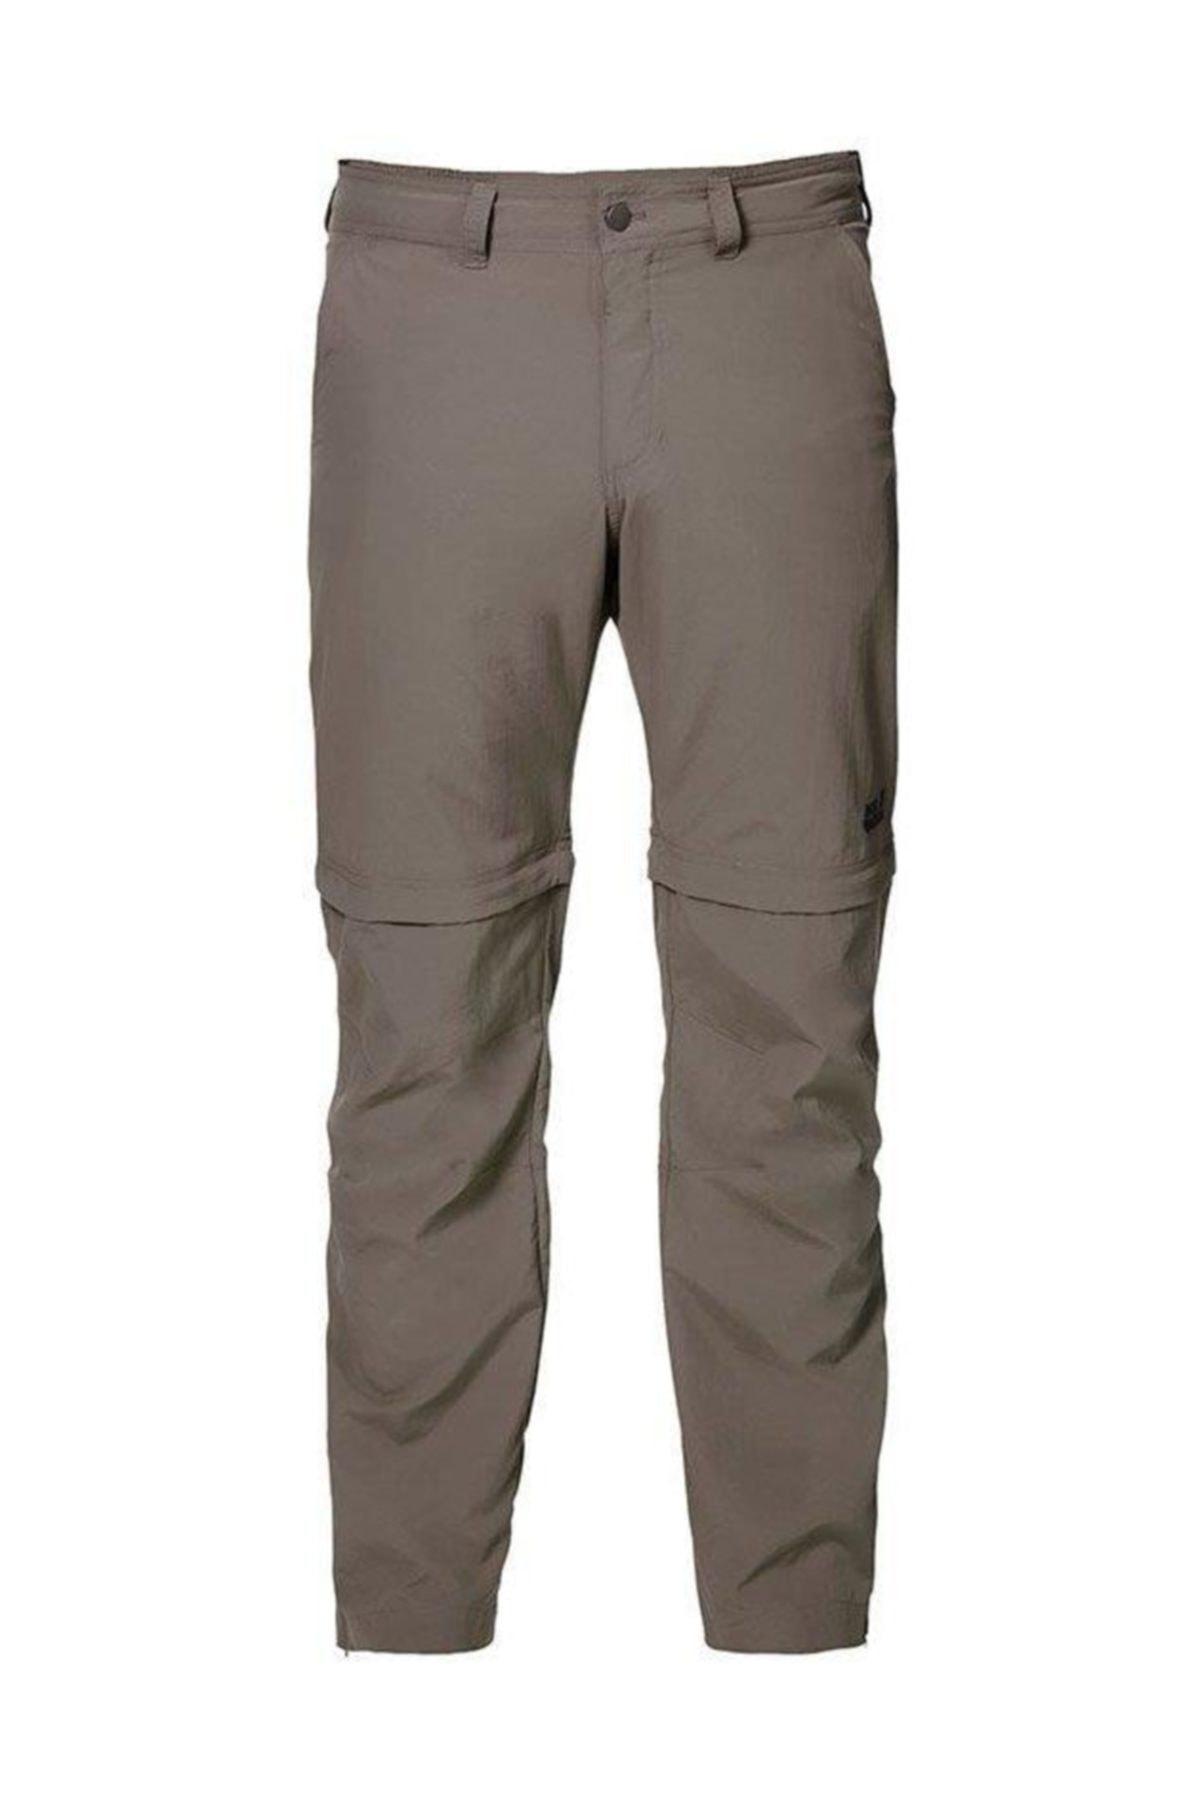 Jack Wolfskin Canyon Zip Off Erkek Pantolonu - 1504191-5116 1